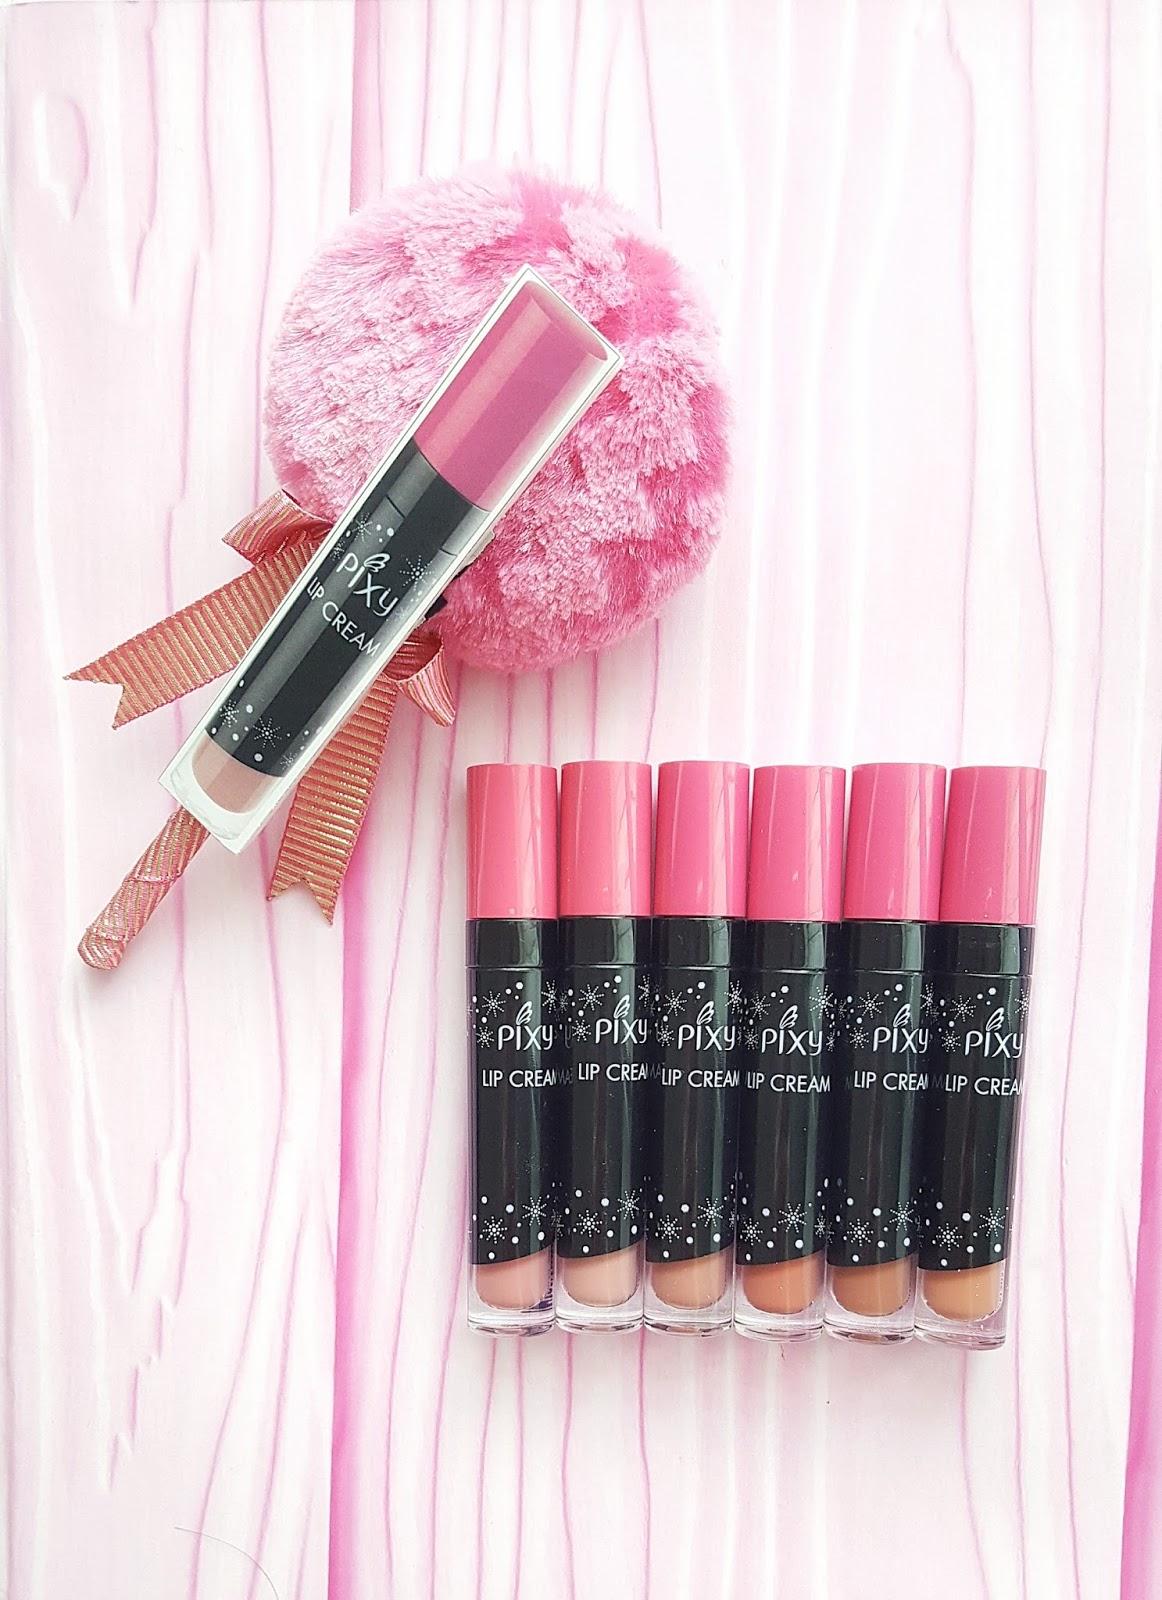 Promo Pixy Lip Cream Termurah 2018 Cooler Bag Baymax Sj0038 Pink Panther Launching Nude Colours Edition 2017 Ternyata Baru Aja Lohh Ngeluncurin Dengan